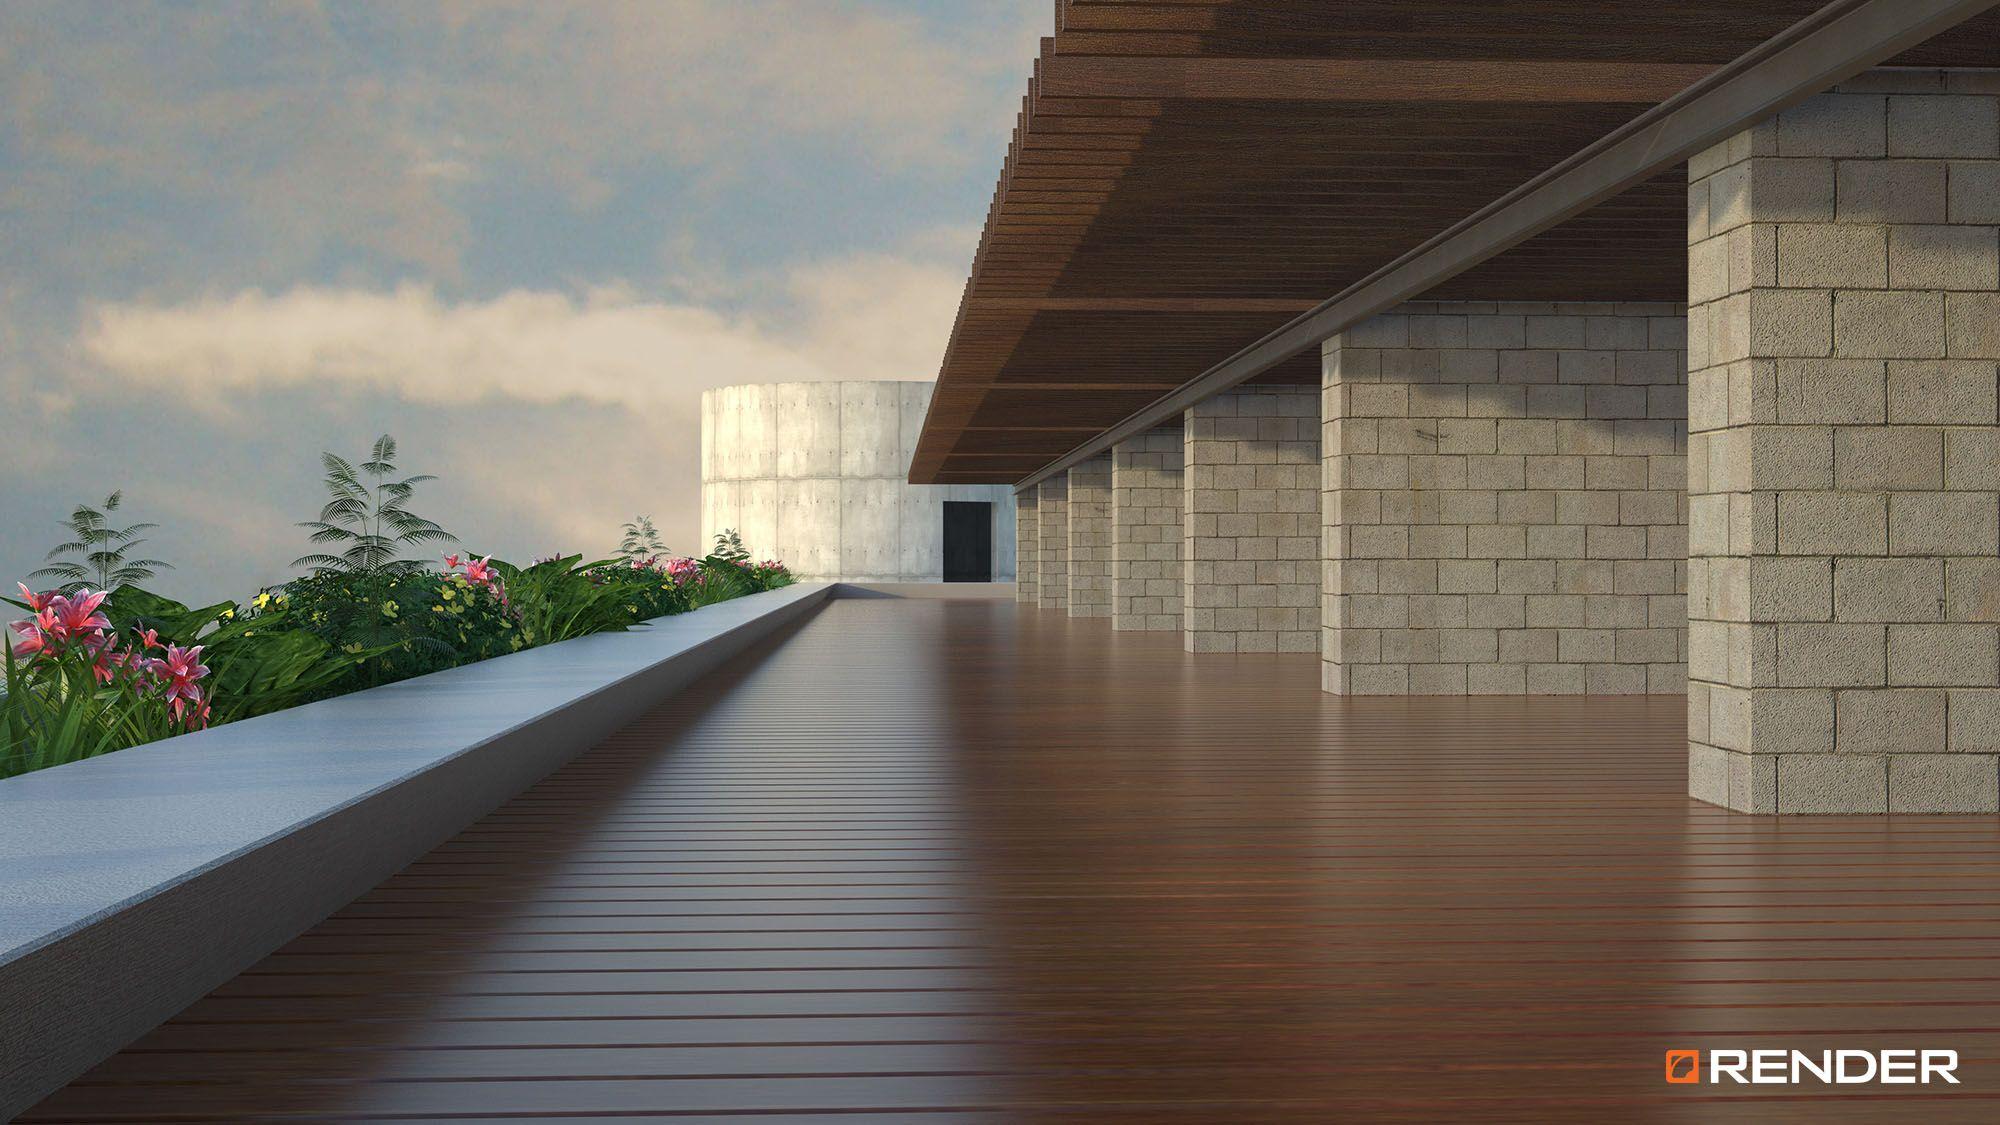 #rosedal #building #render #rendering #3d #realestate #architecture #exterior #méxico #design #rendermediasolutions #bettersales